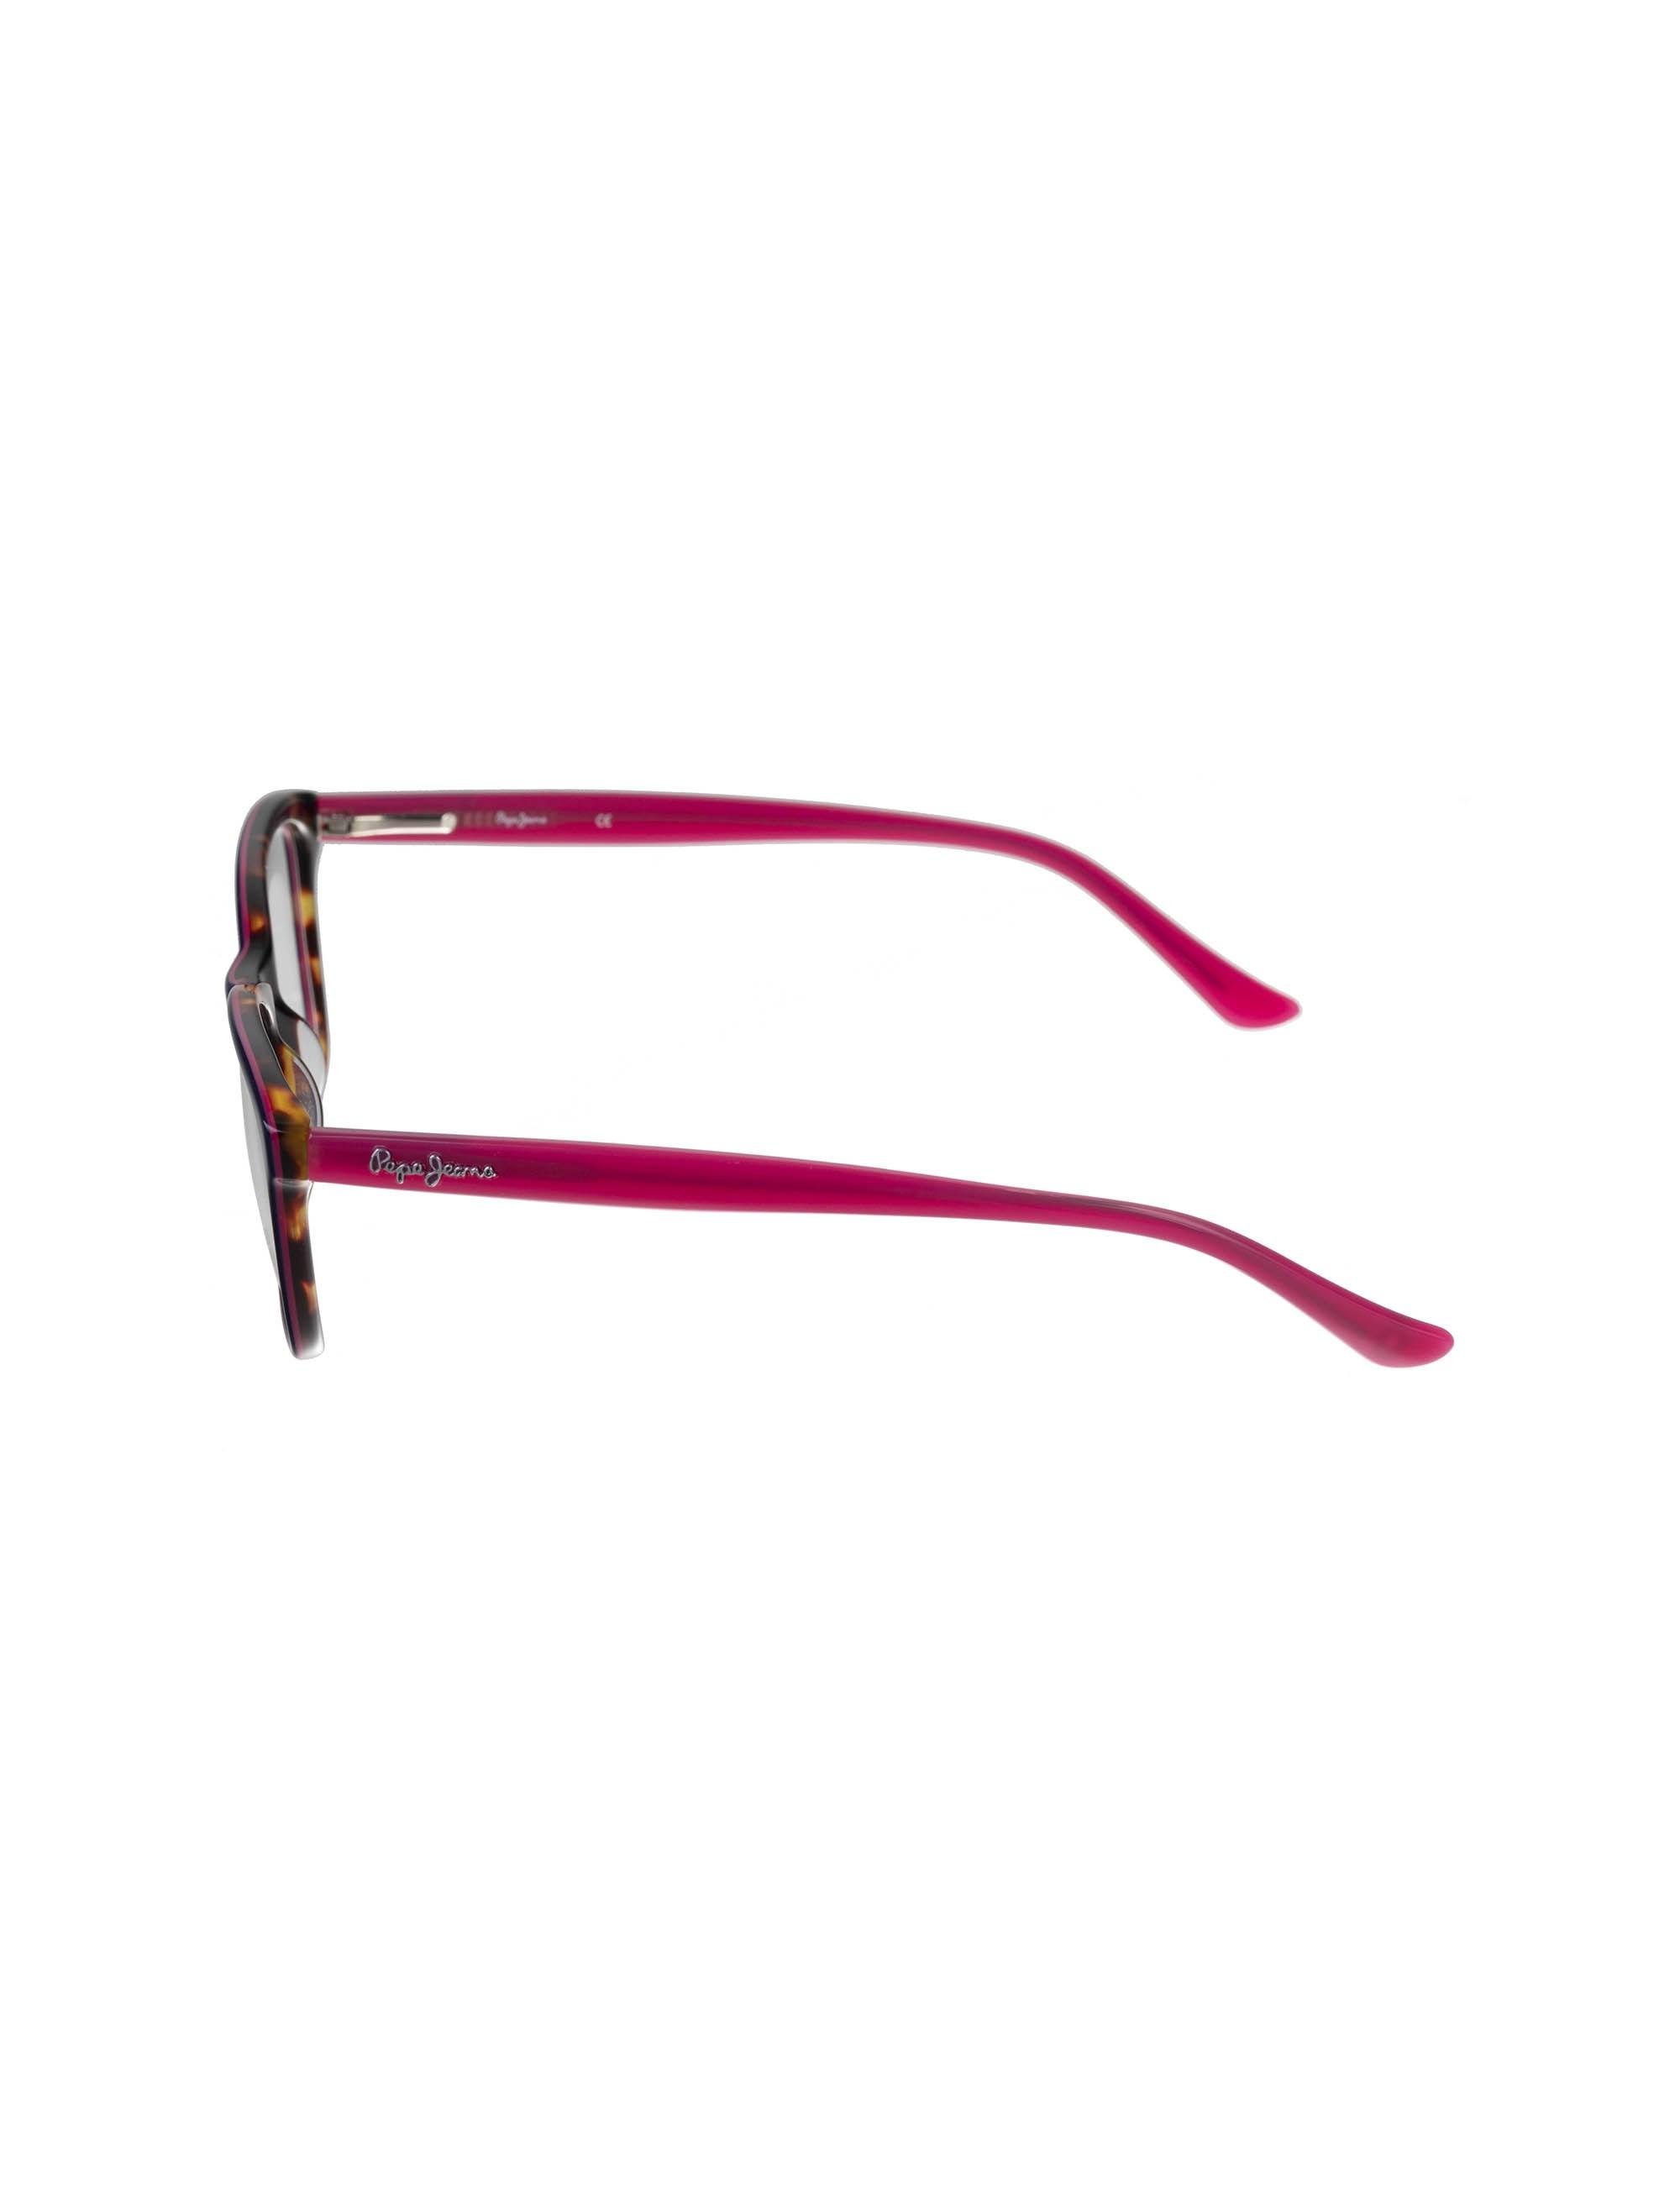 عینک طبی ویفرر زنانه - پپه جینز - بنفش - 2